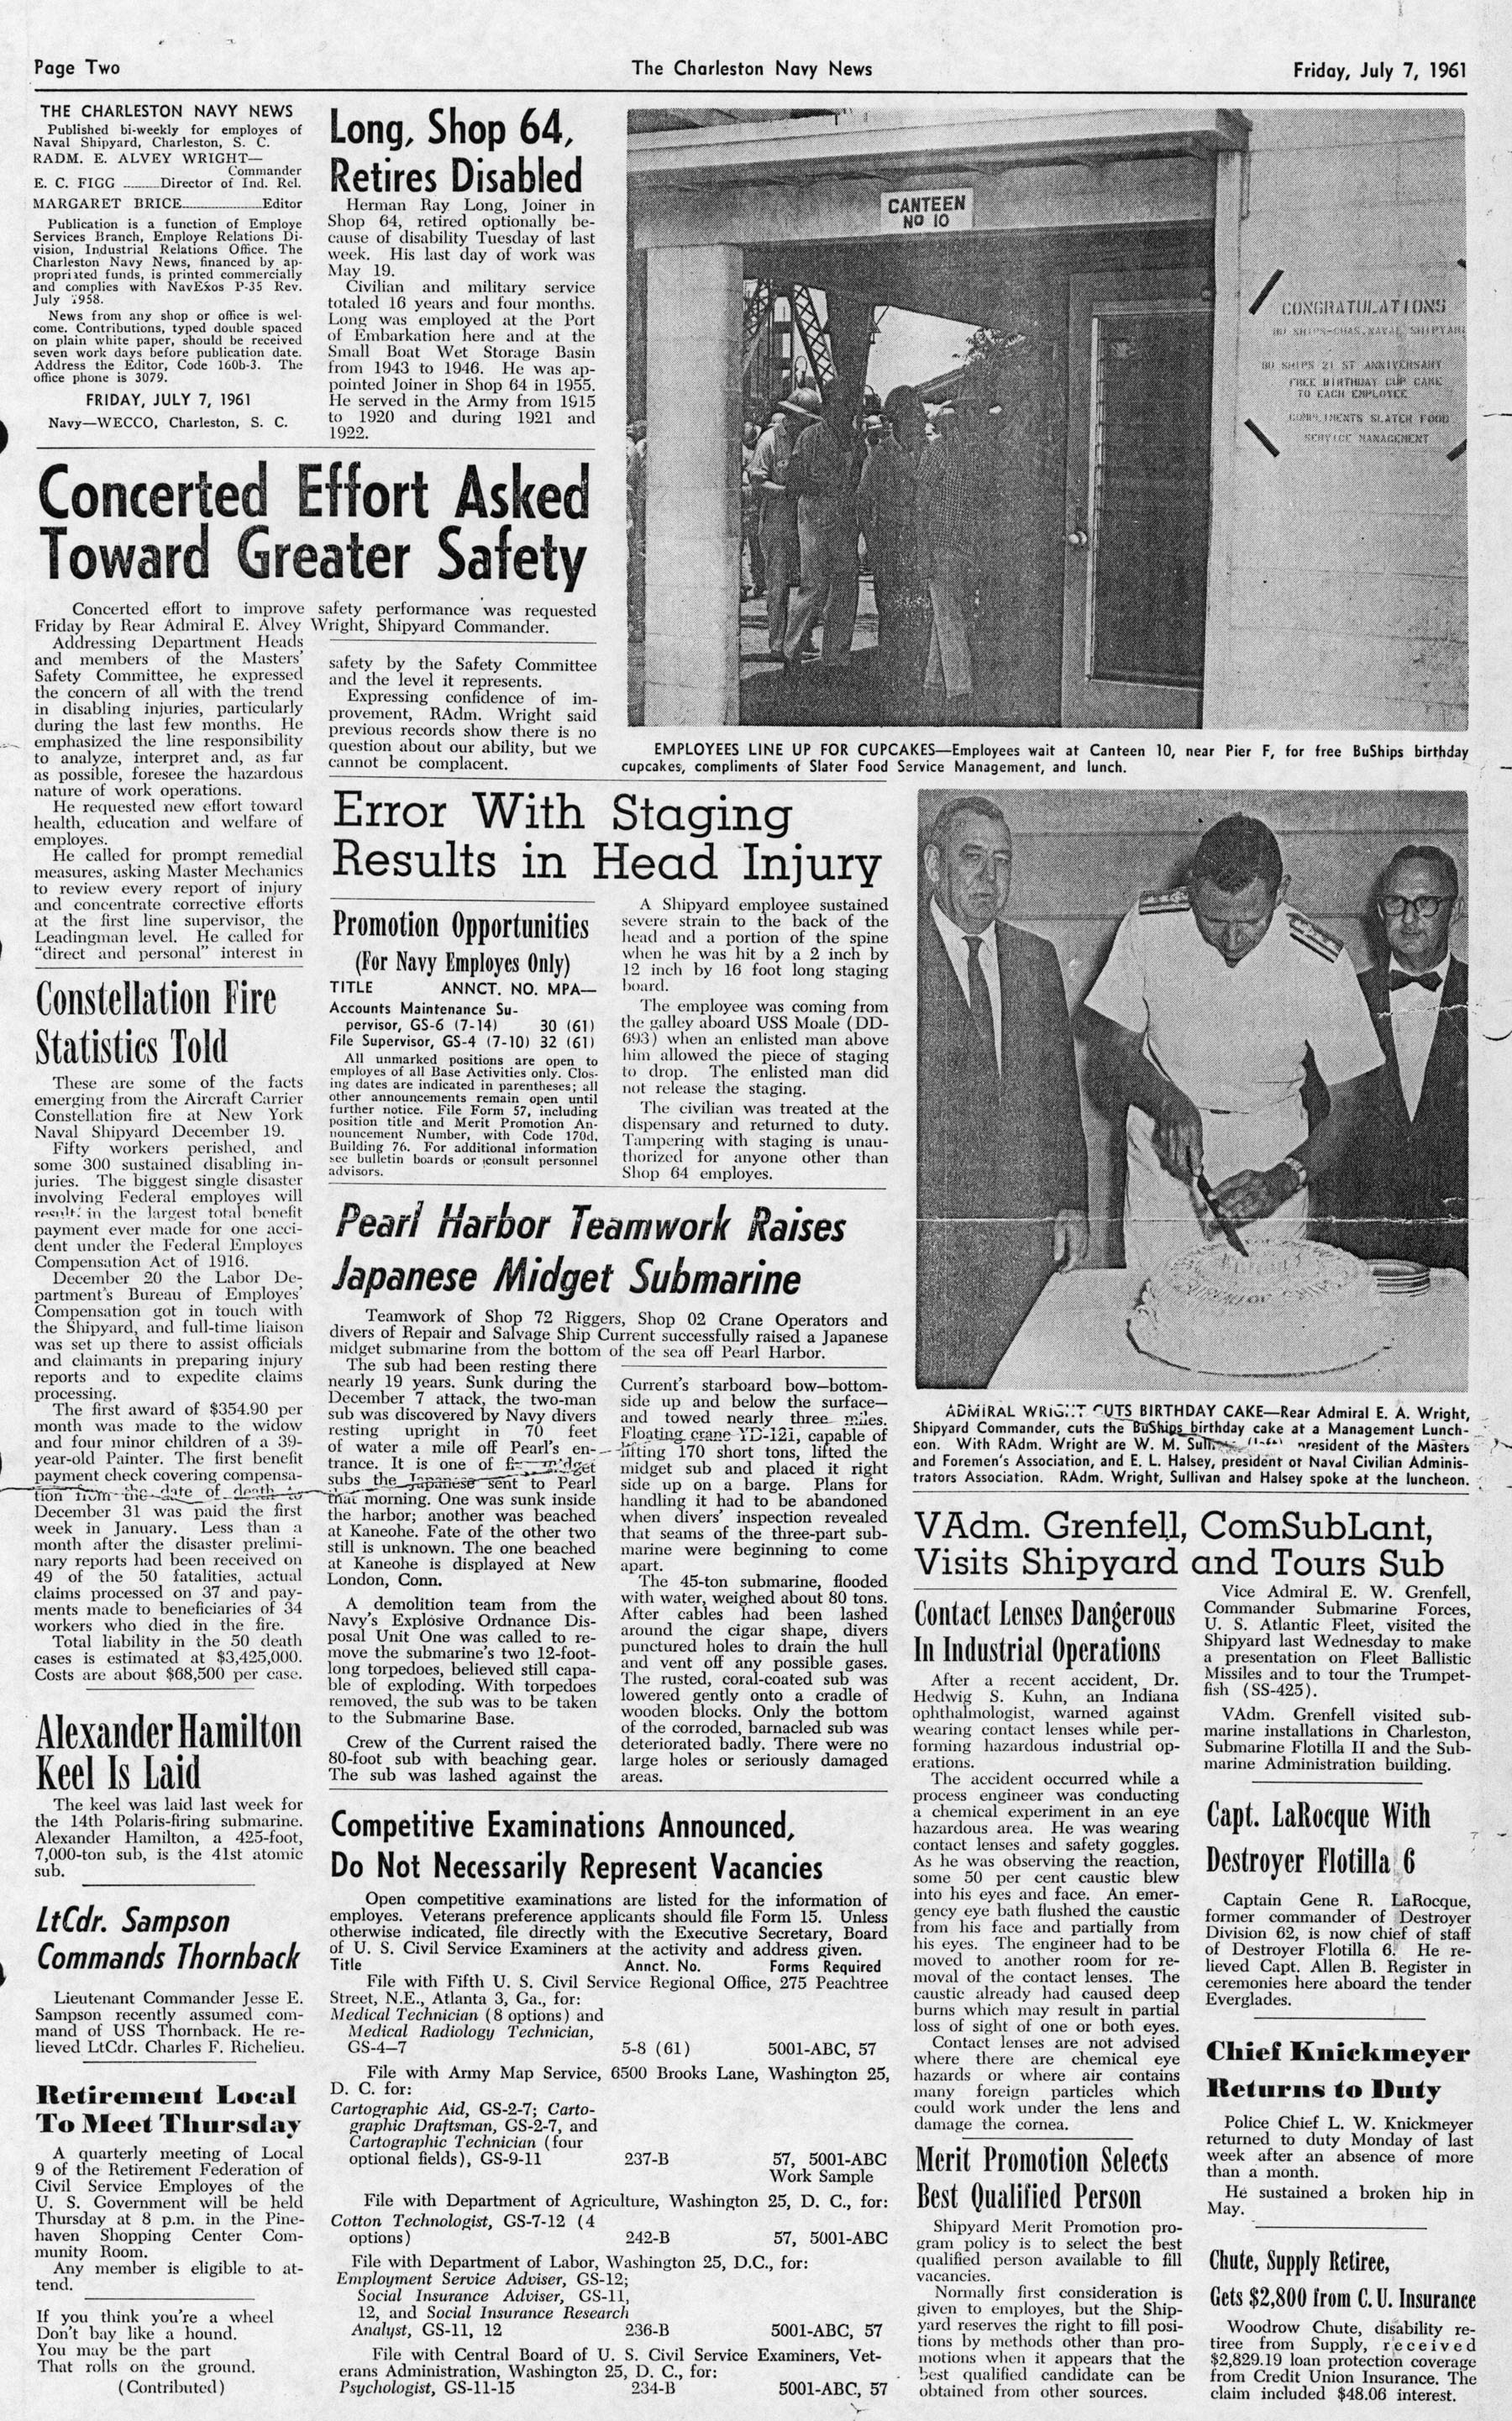 The Charleston Navy News, Volume 20, Edition 1, page ii